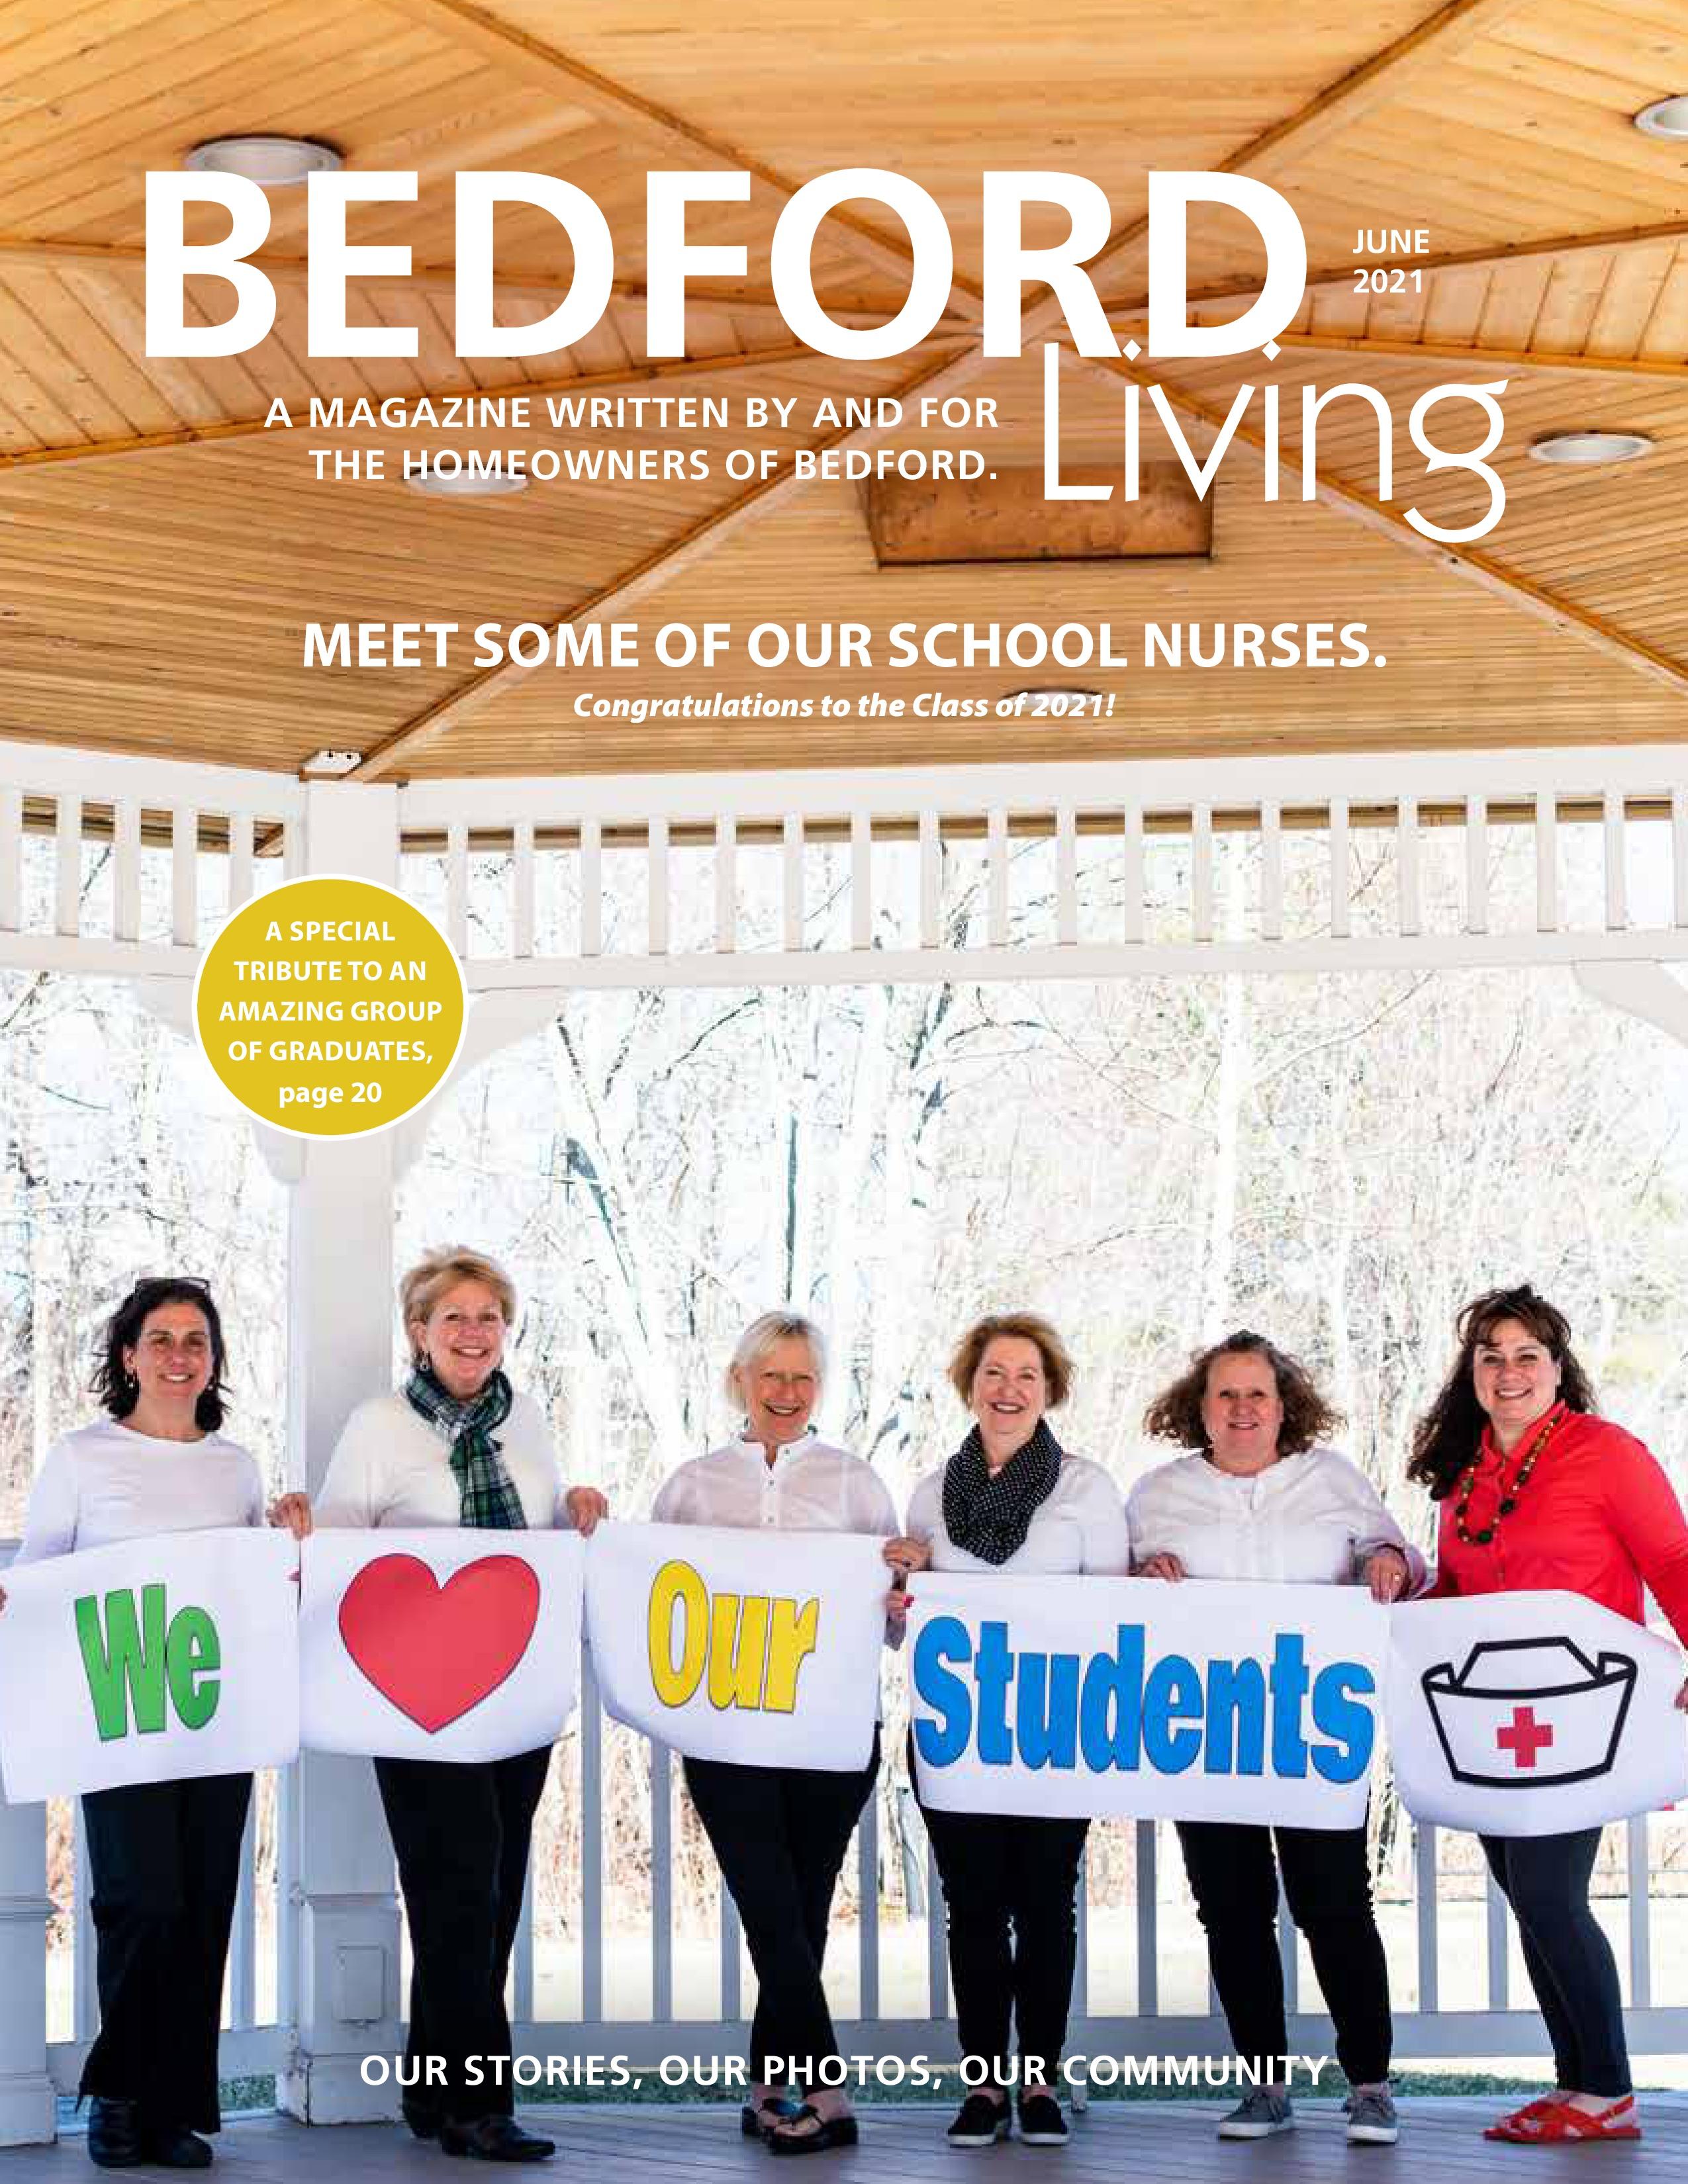 Bedford Living 2021-06-01